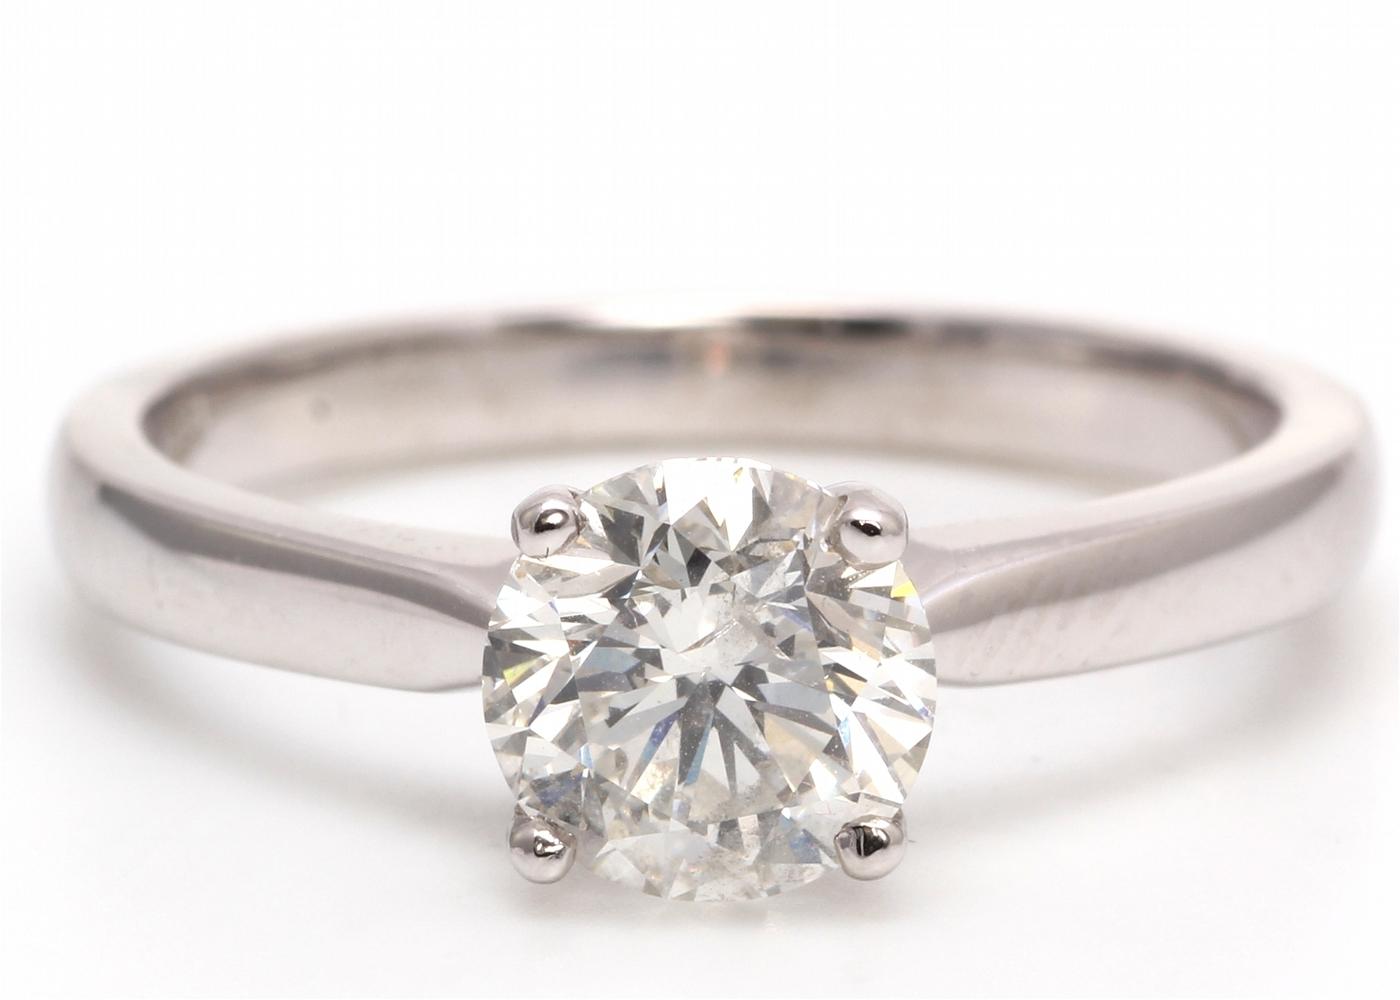 18ct White Gold Single Stone Diamond Ring 1.05 Carats